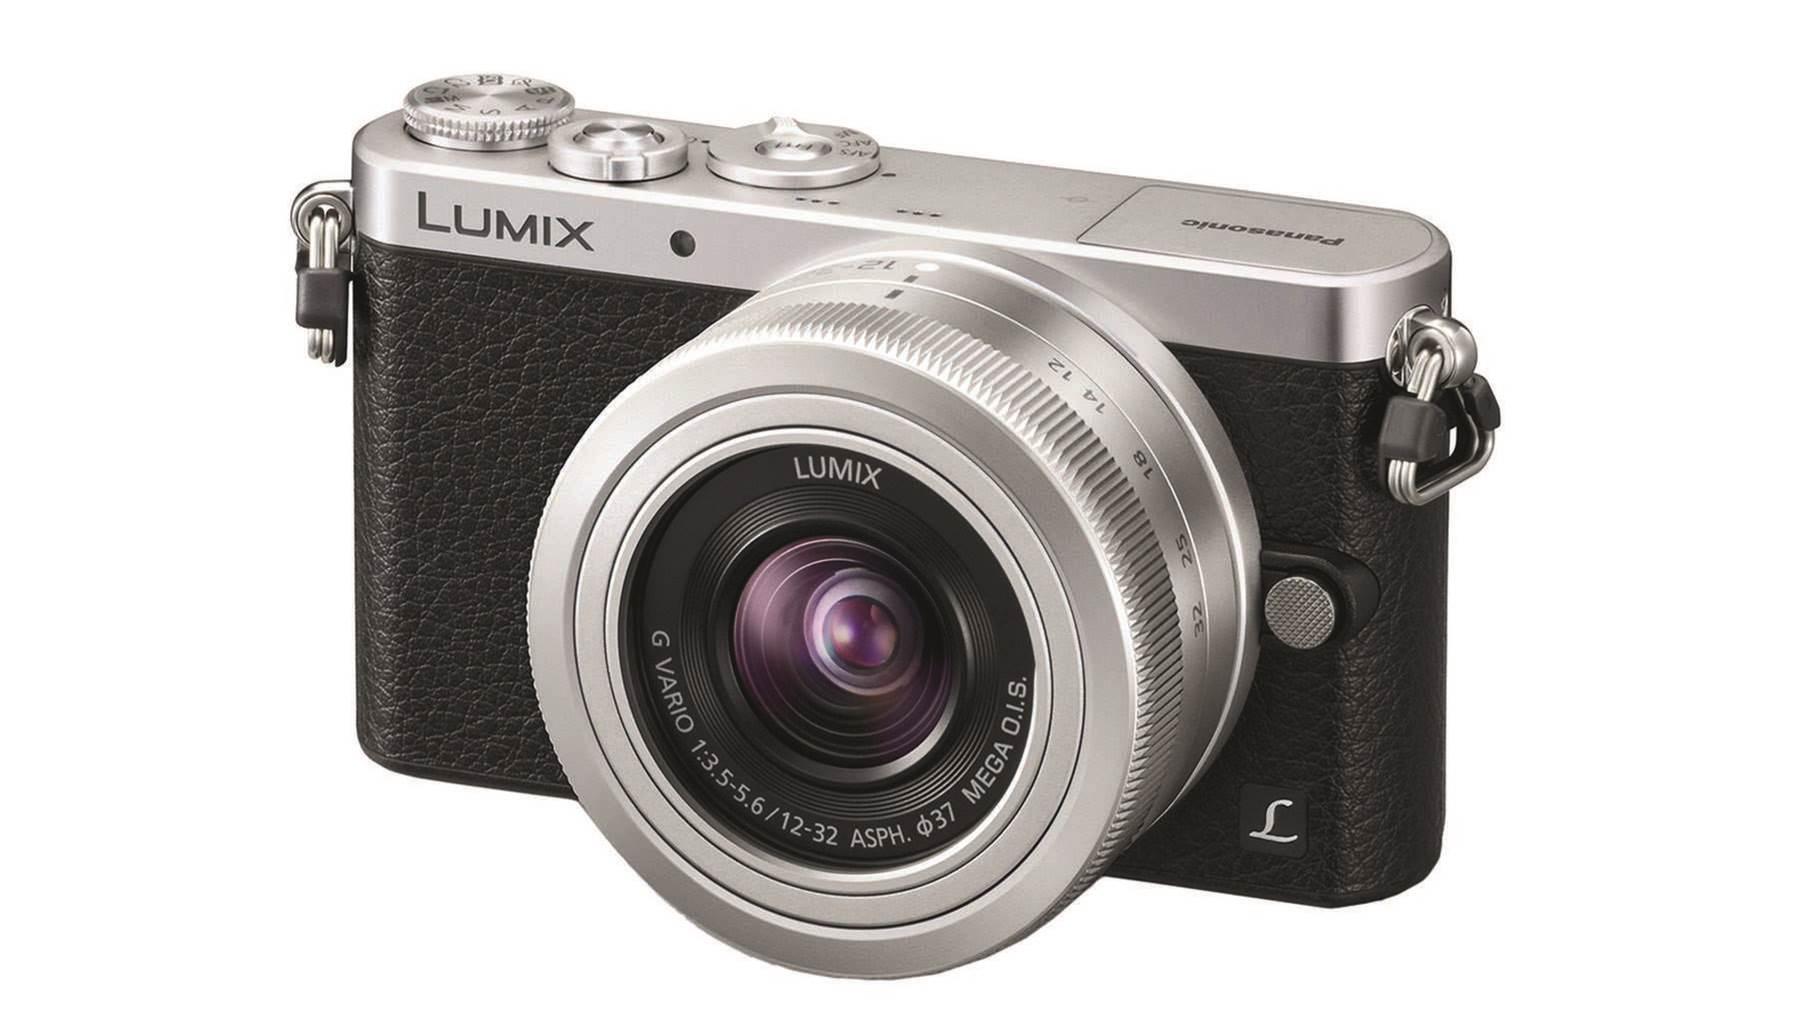 Review: Panasonic Lumix DMC-GM1